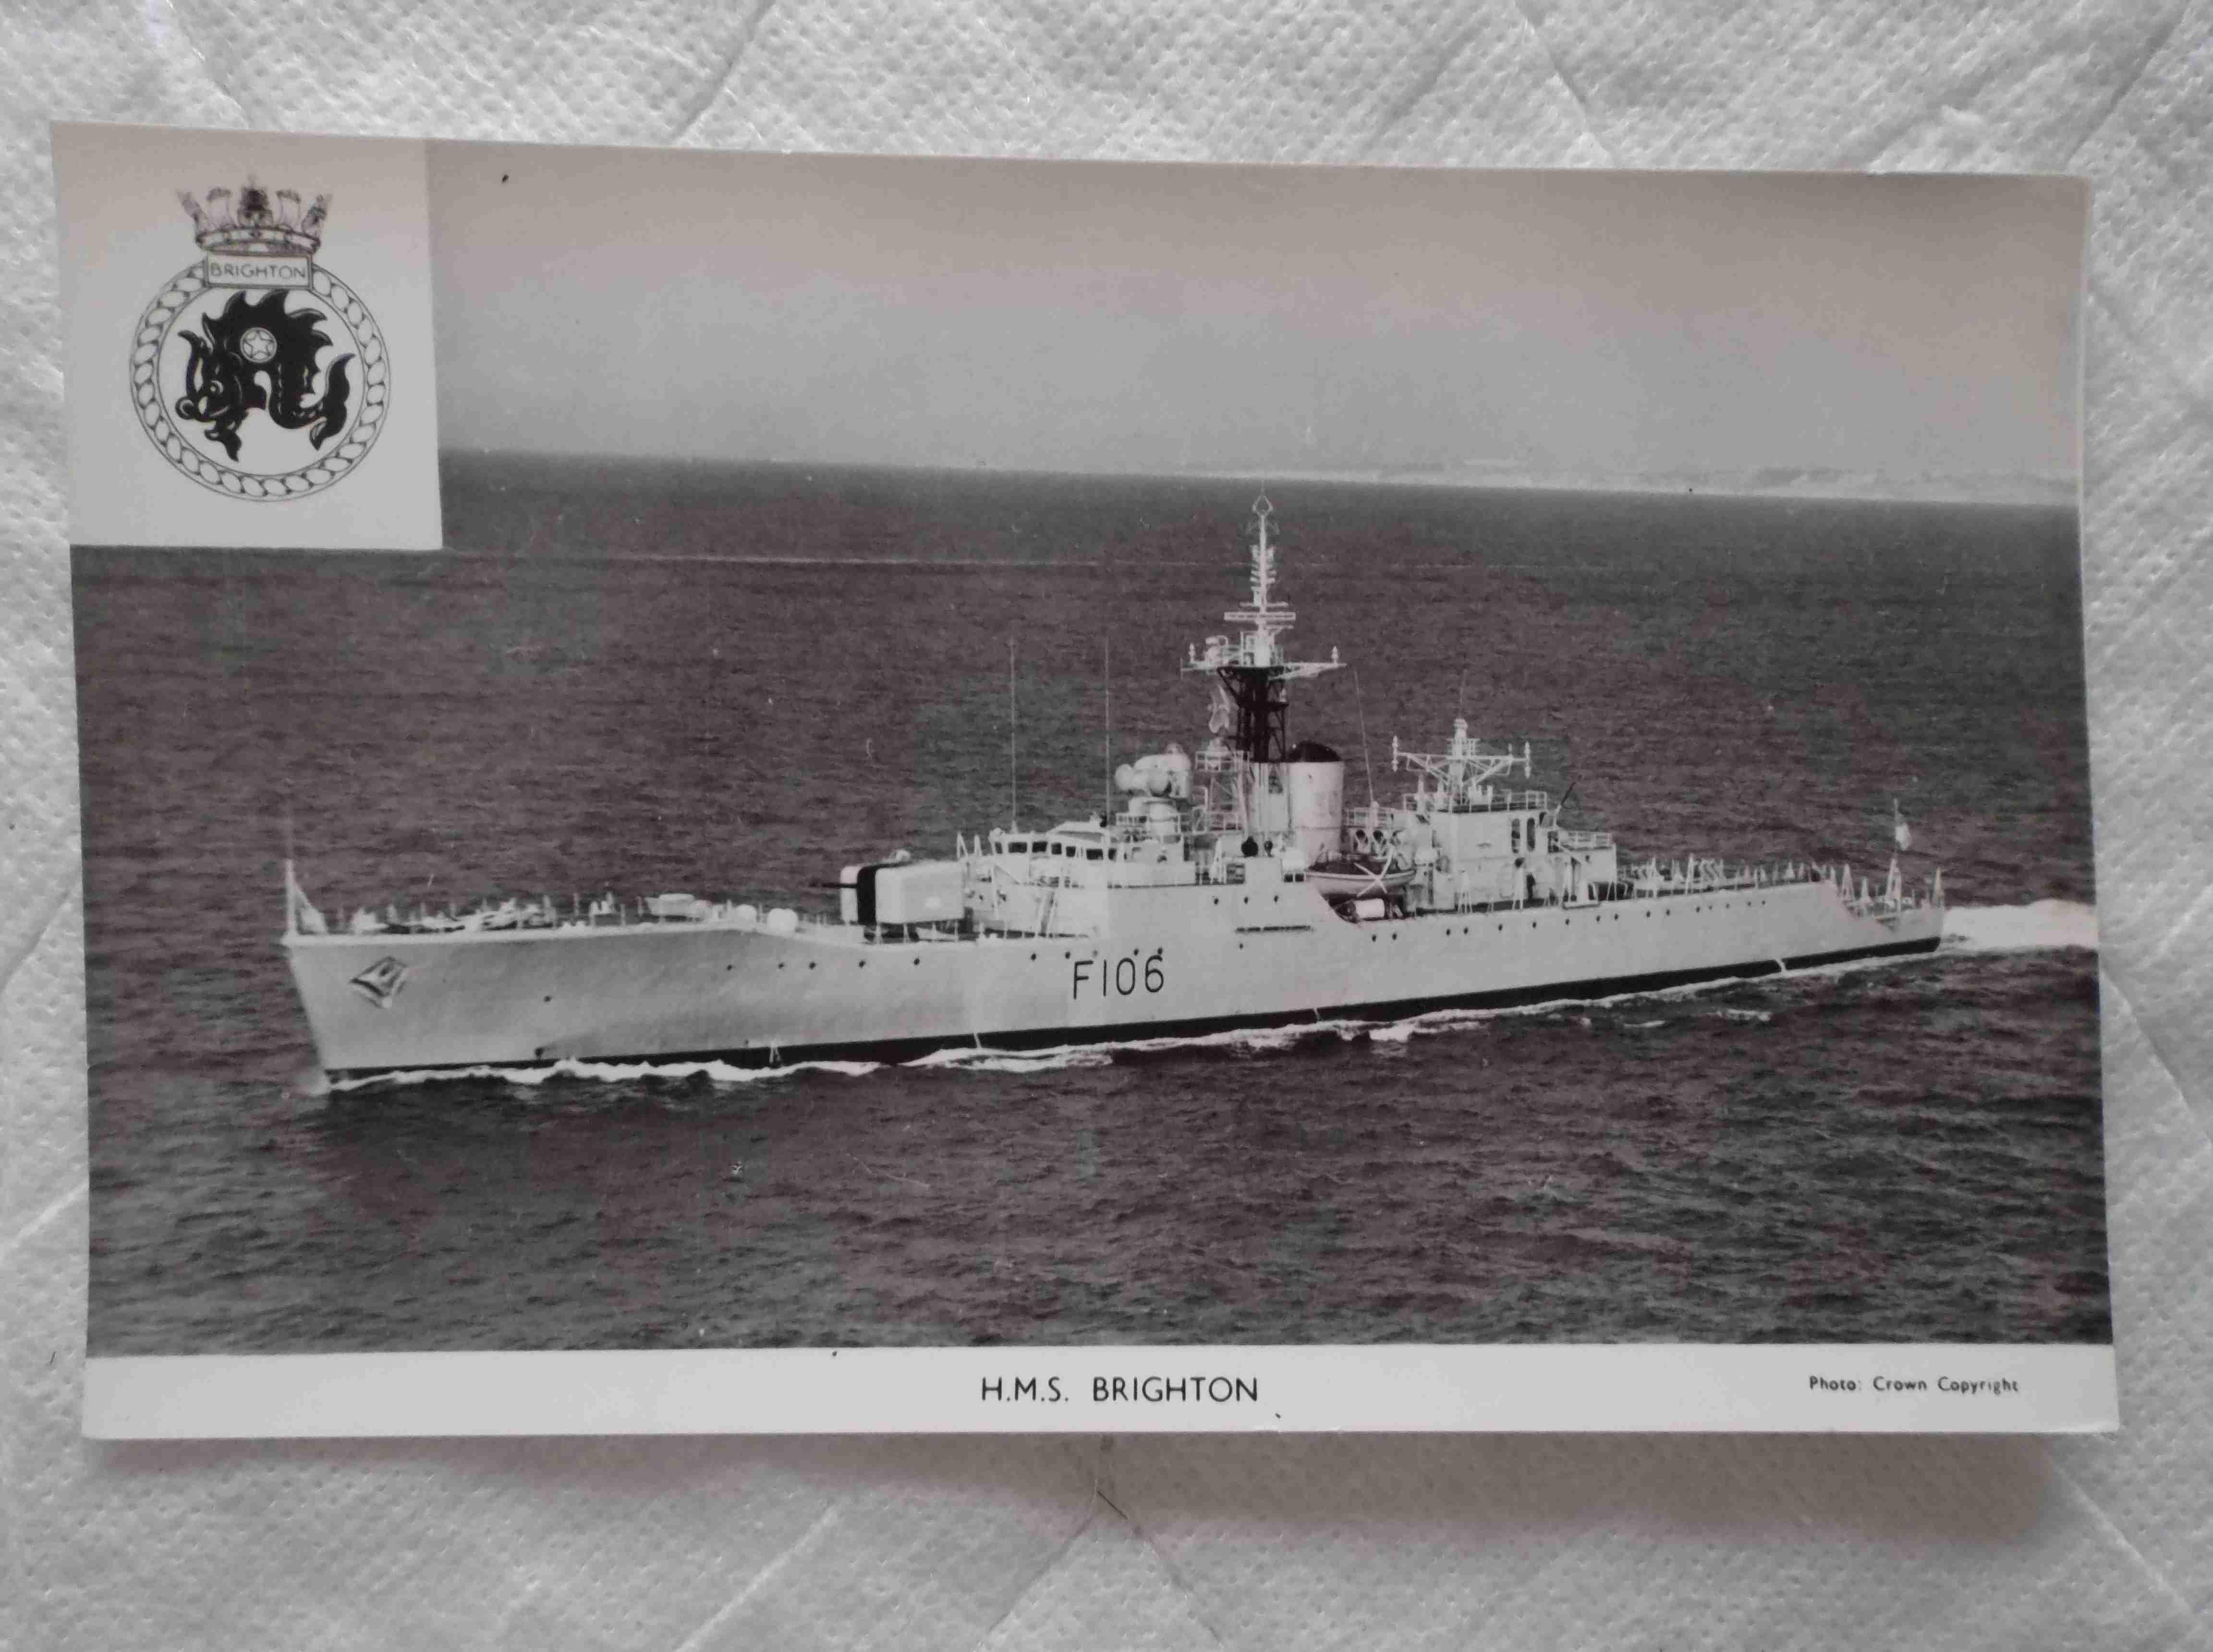 POSTCARD OF THE ROYAL NAVAL VESSEL HMS BRIGHTON